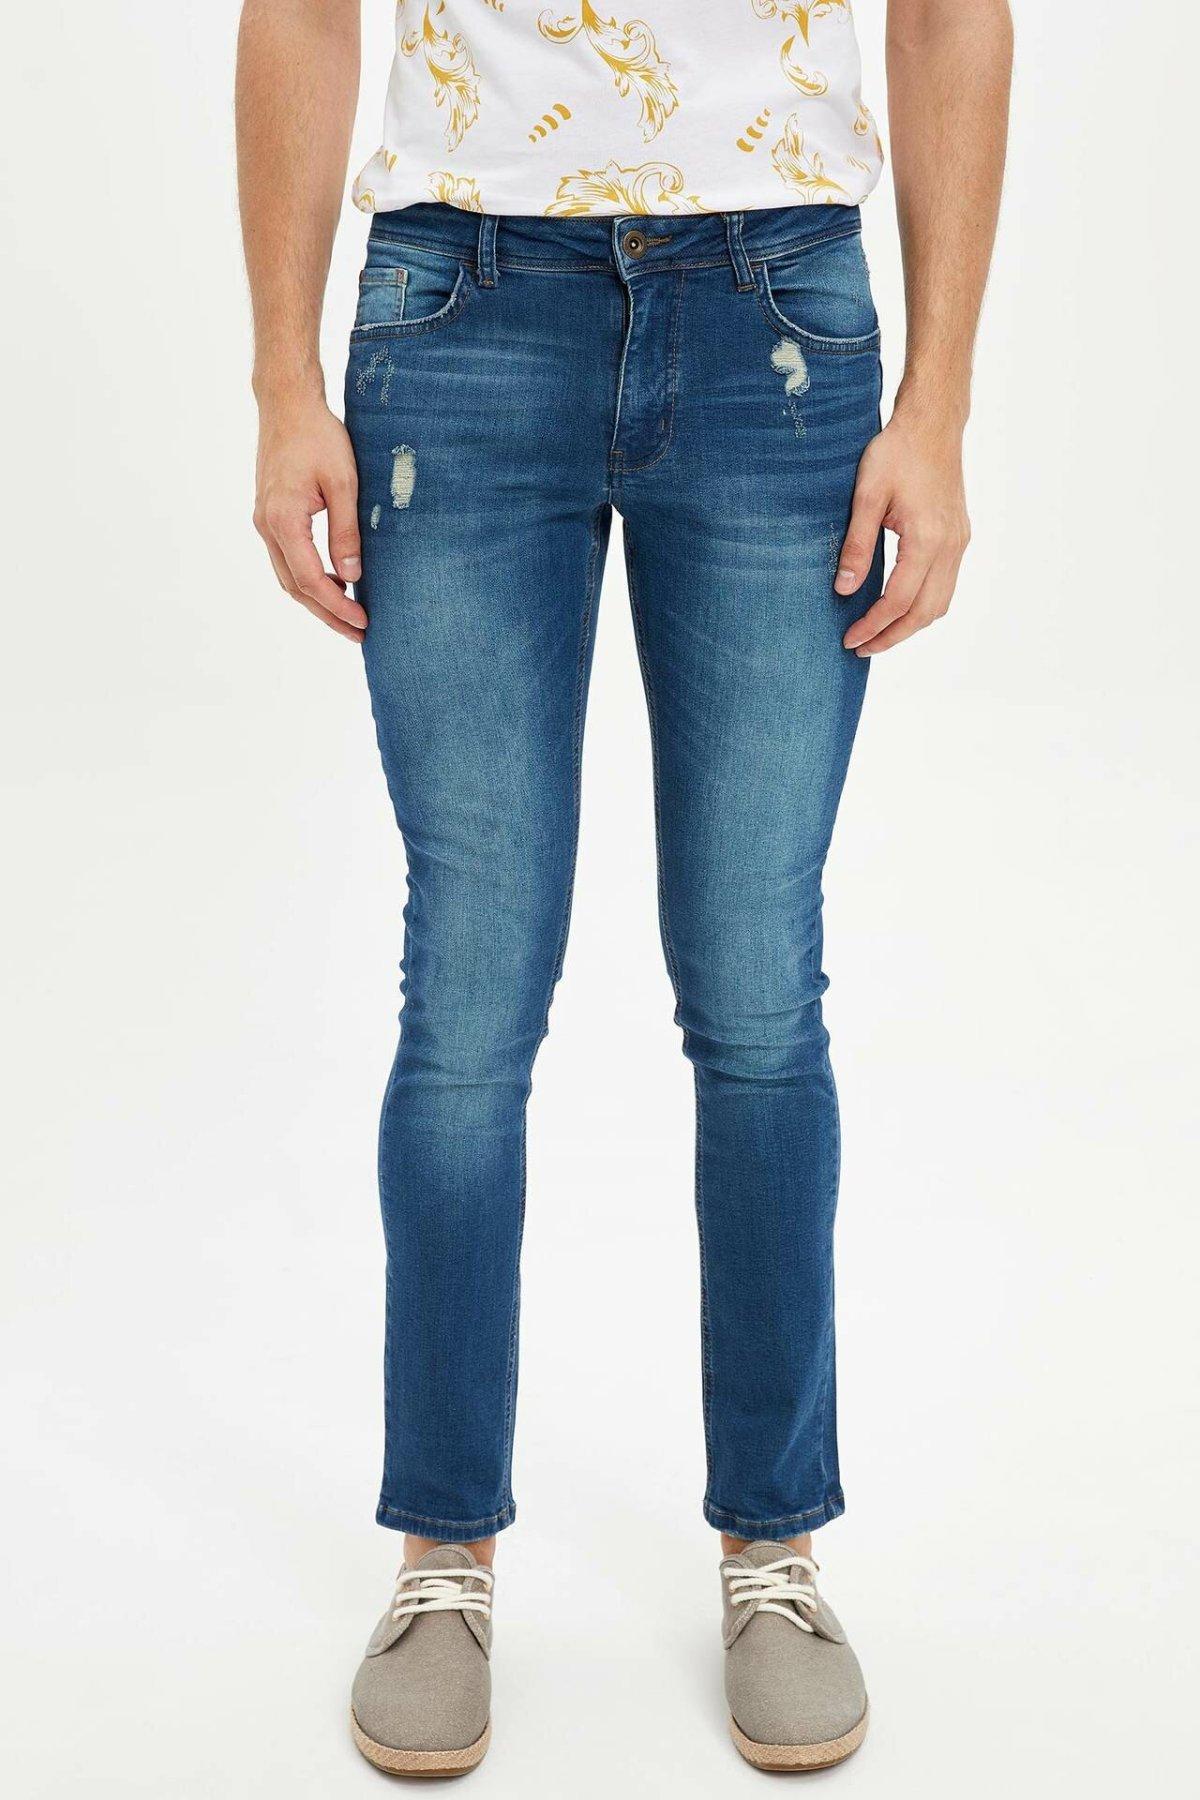 DeFacto Man Fashion Blue Worn Simple Trousers Jeans Casual Classic Denim Jeans Casual Skinny Elasticity Pants Male -K8897AZ19SM